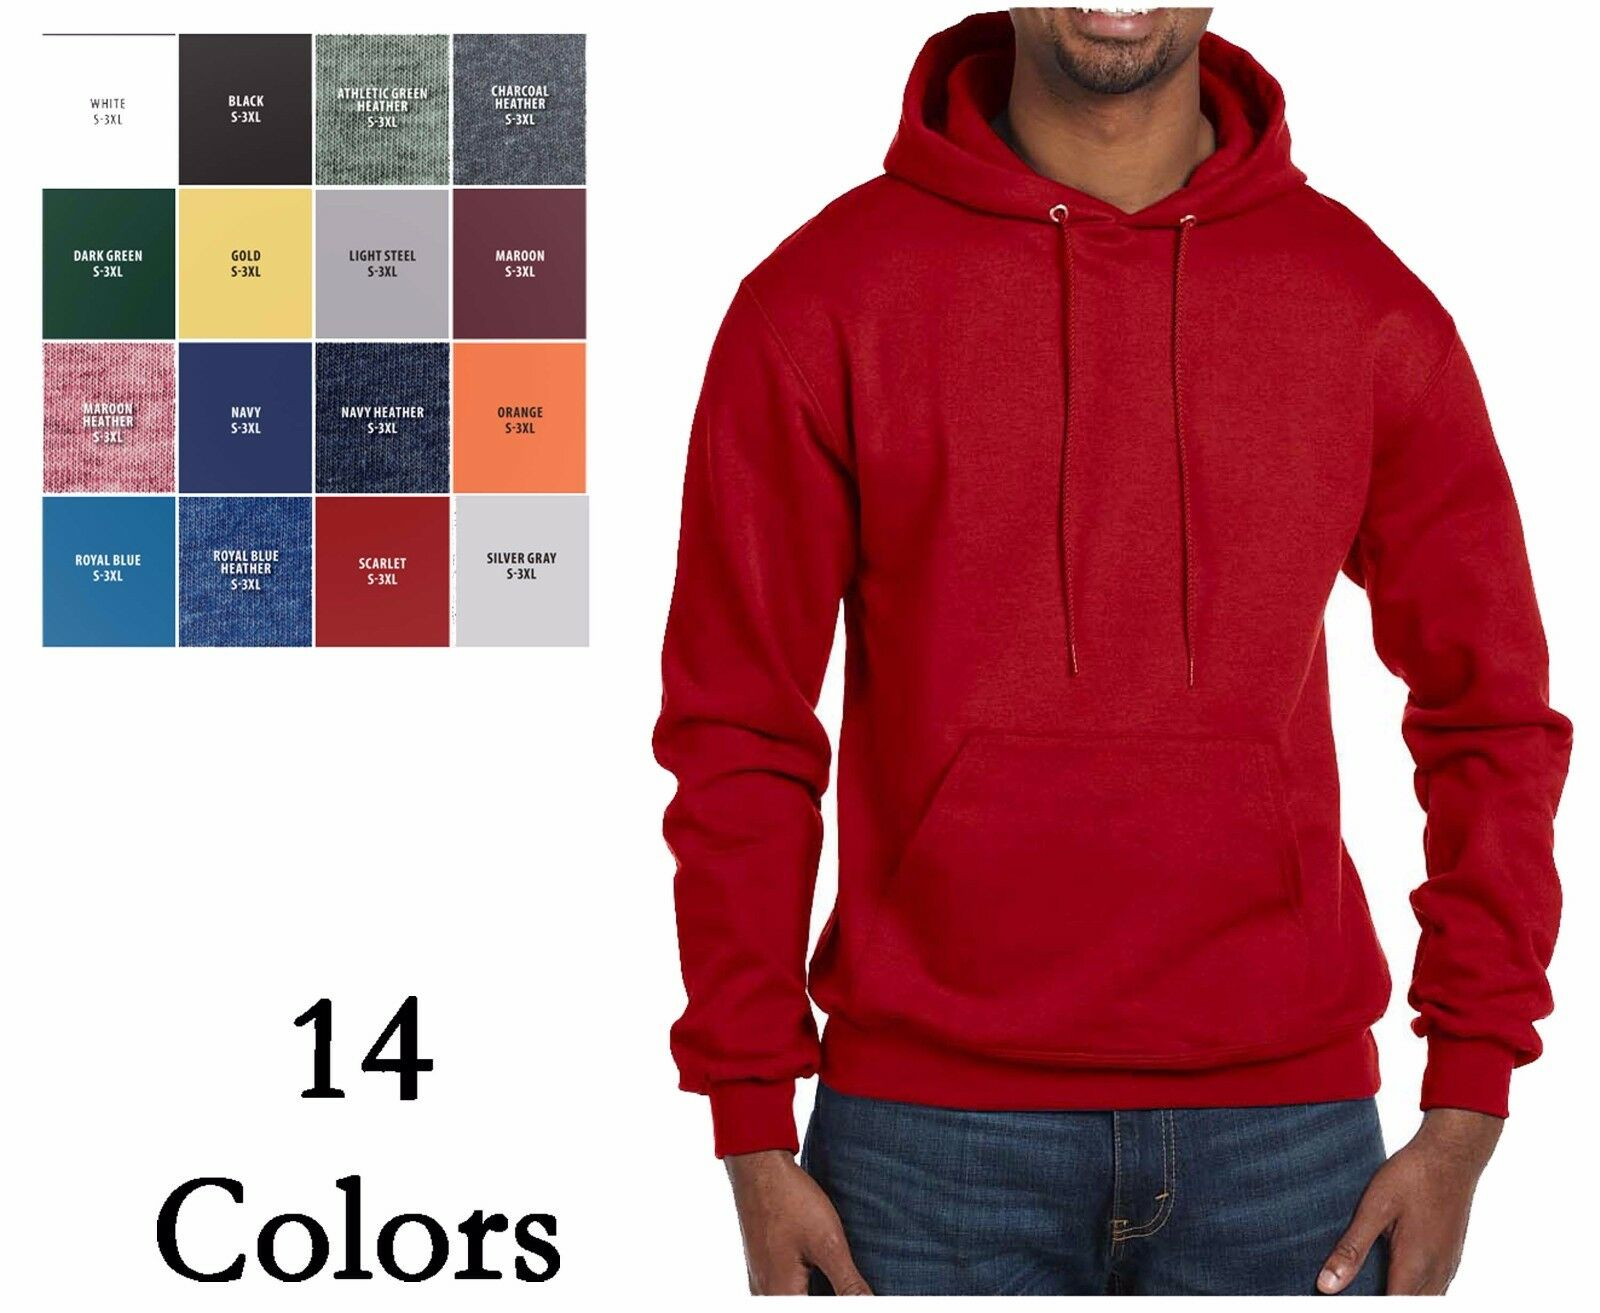 91869863b6a5 Details about Champion Eco-friendly Fleece Pullover Hoodie Sweatshirt warm  S-3XL